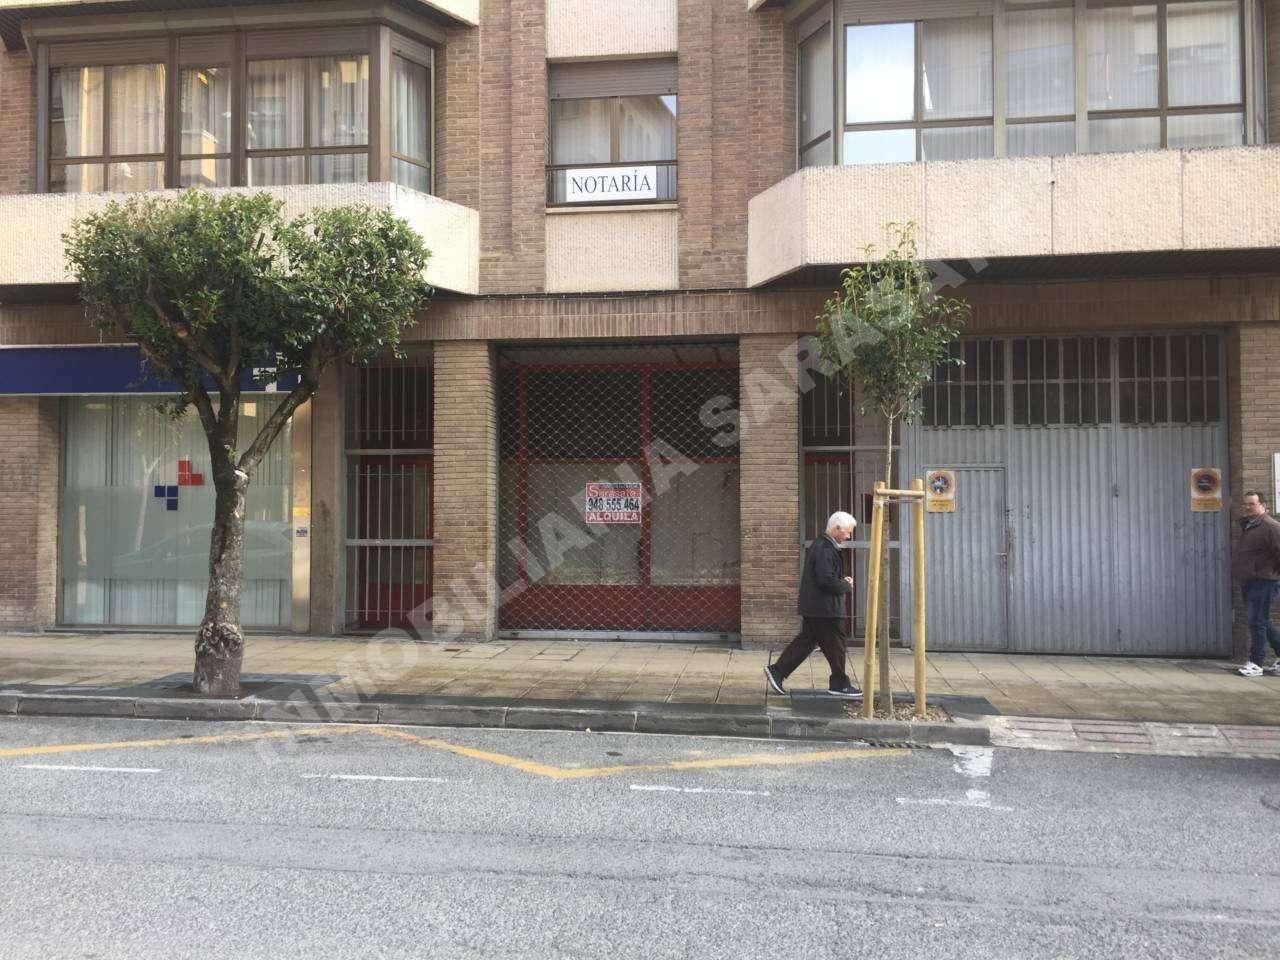 ALQUILER DE LOCAL EN PSEO. INMACULADA, ESTELLA-LIZARRA | REF. (002863)